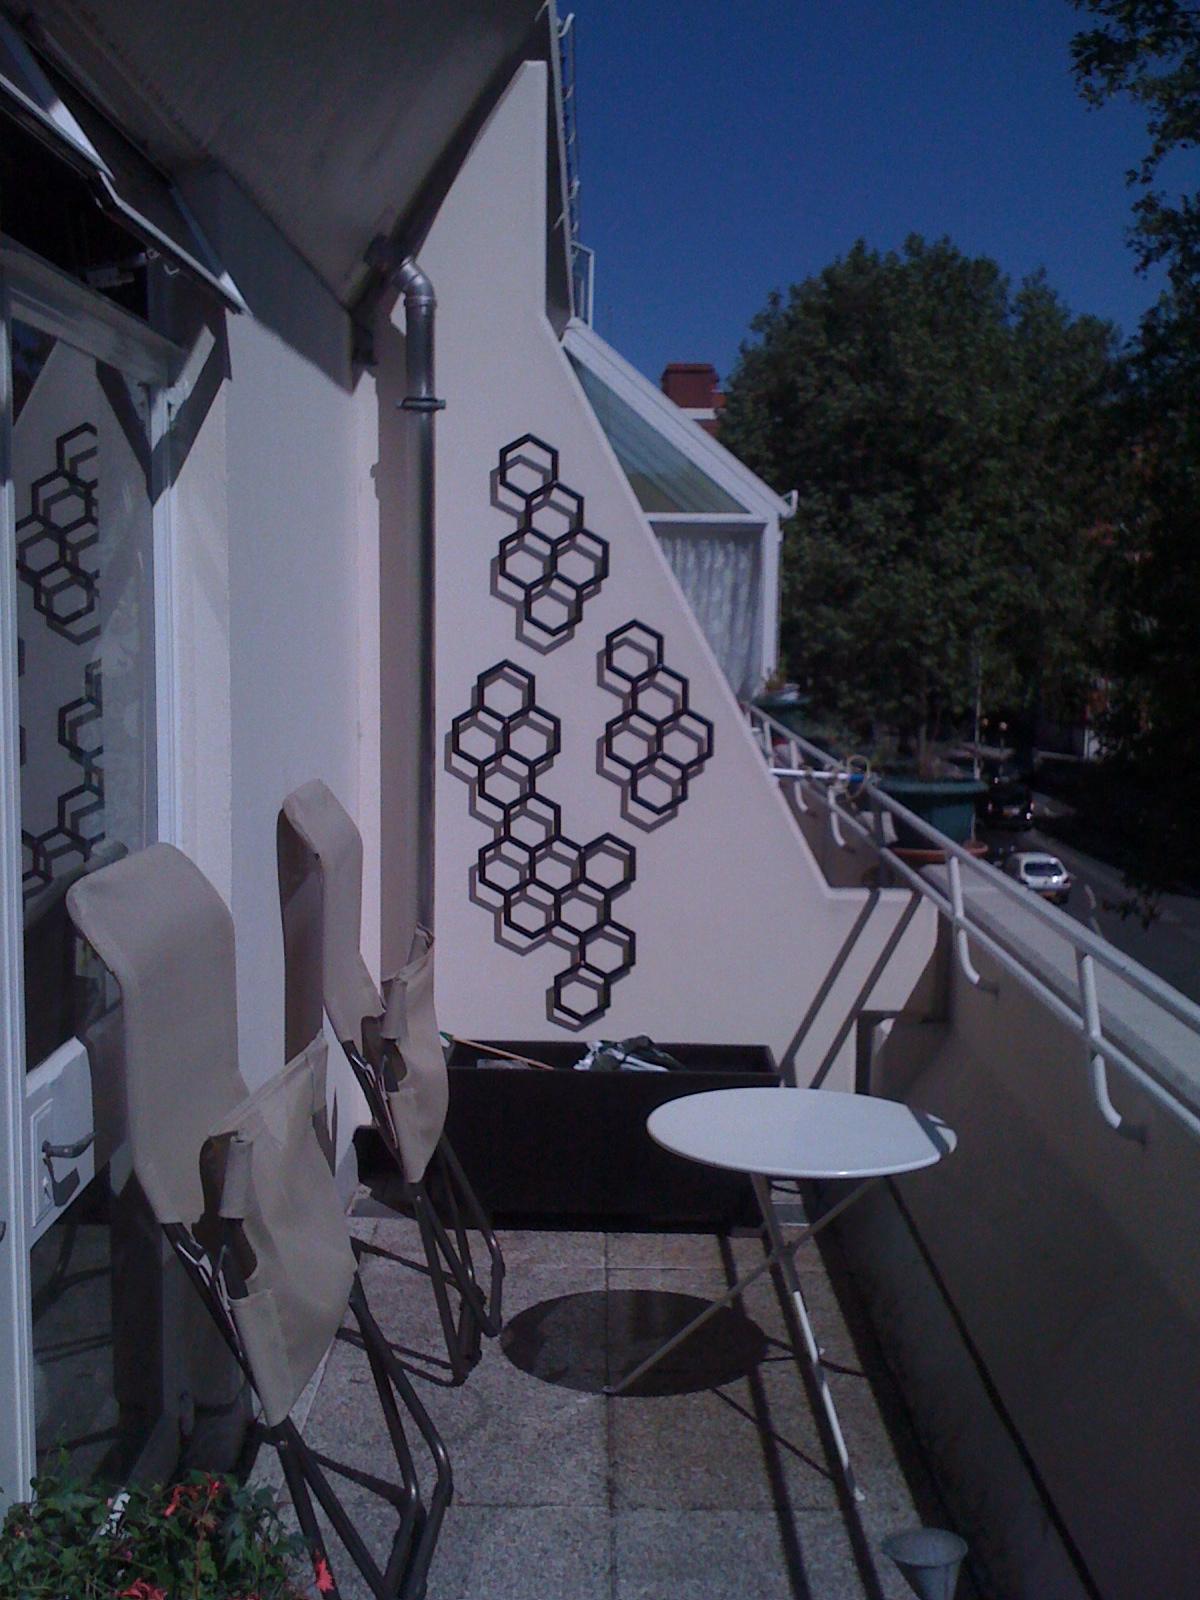 garden wall with art